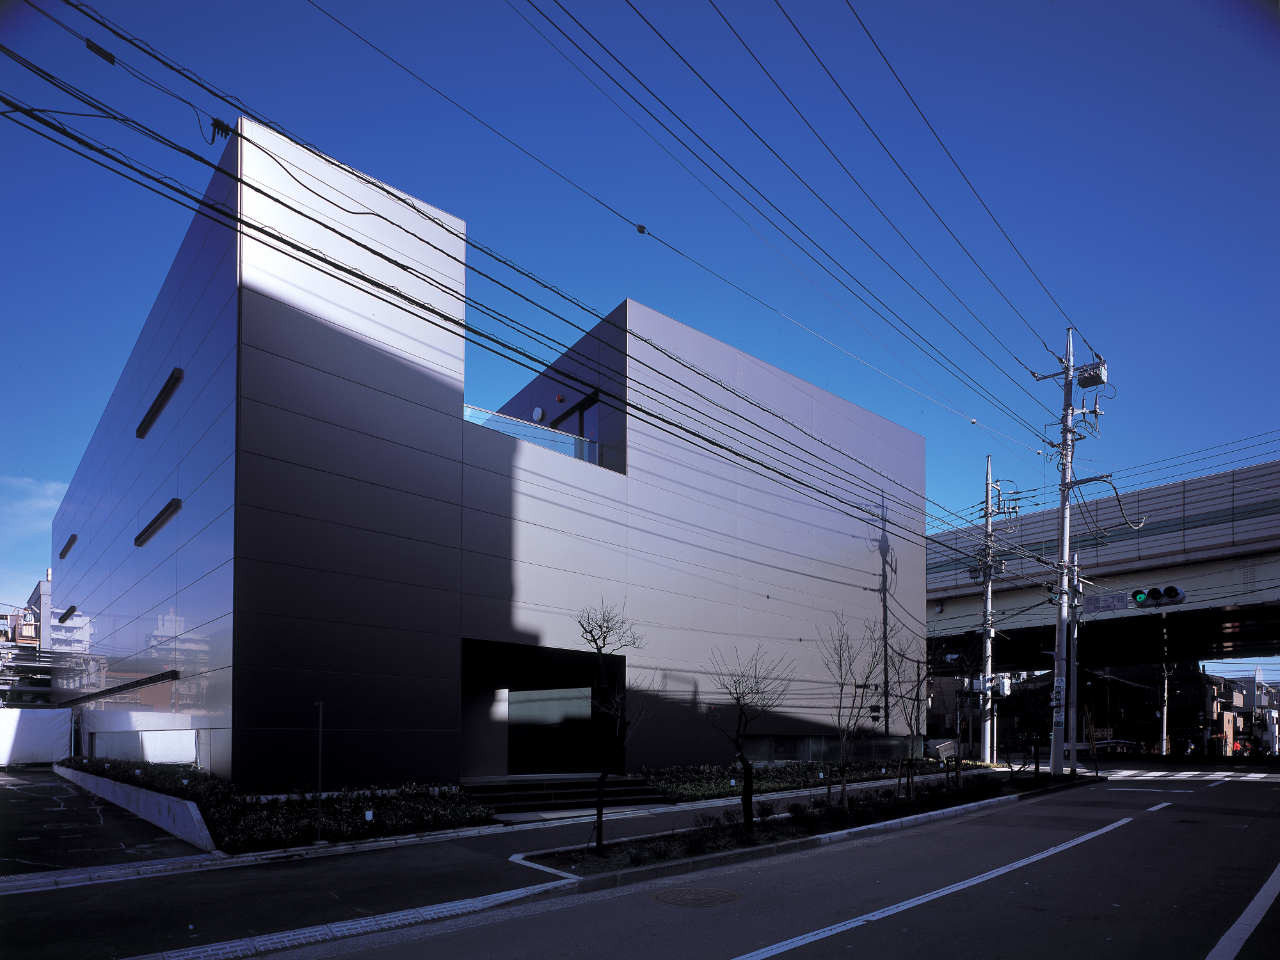 Silent Office / Takashi Yamaguchi & Associates, © Takashi Yamaguchi & Associates